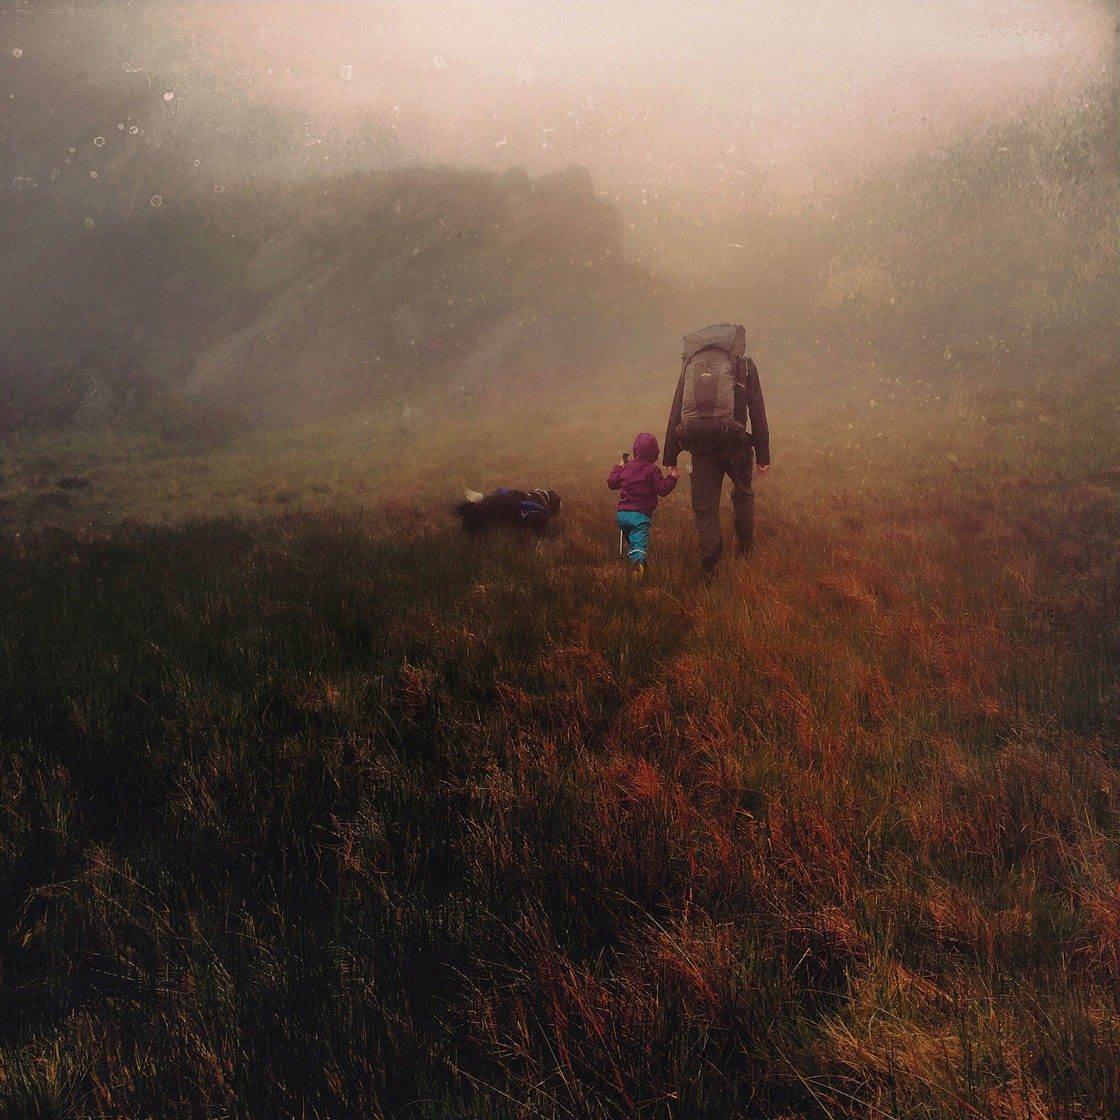 Fog & Mist iPhone Photos 4 no script